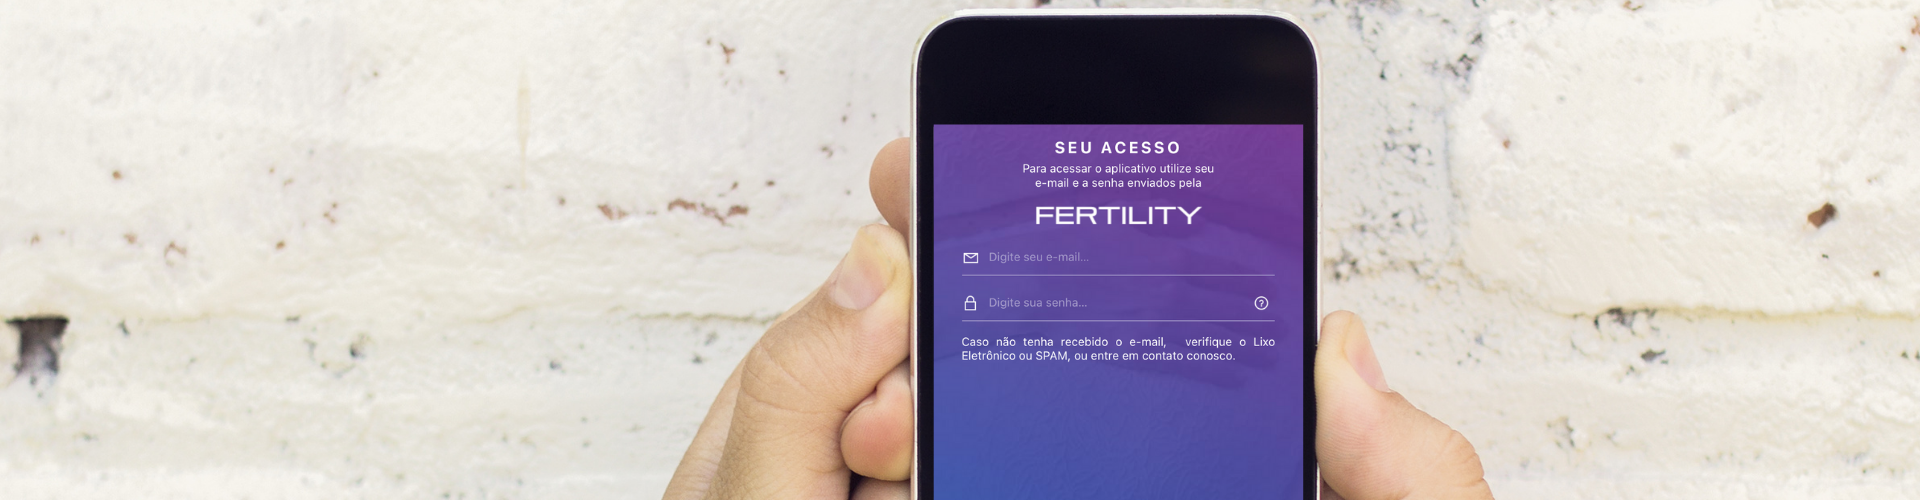 Fertility App